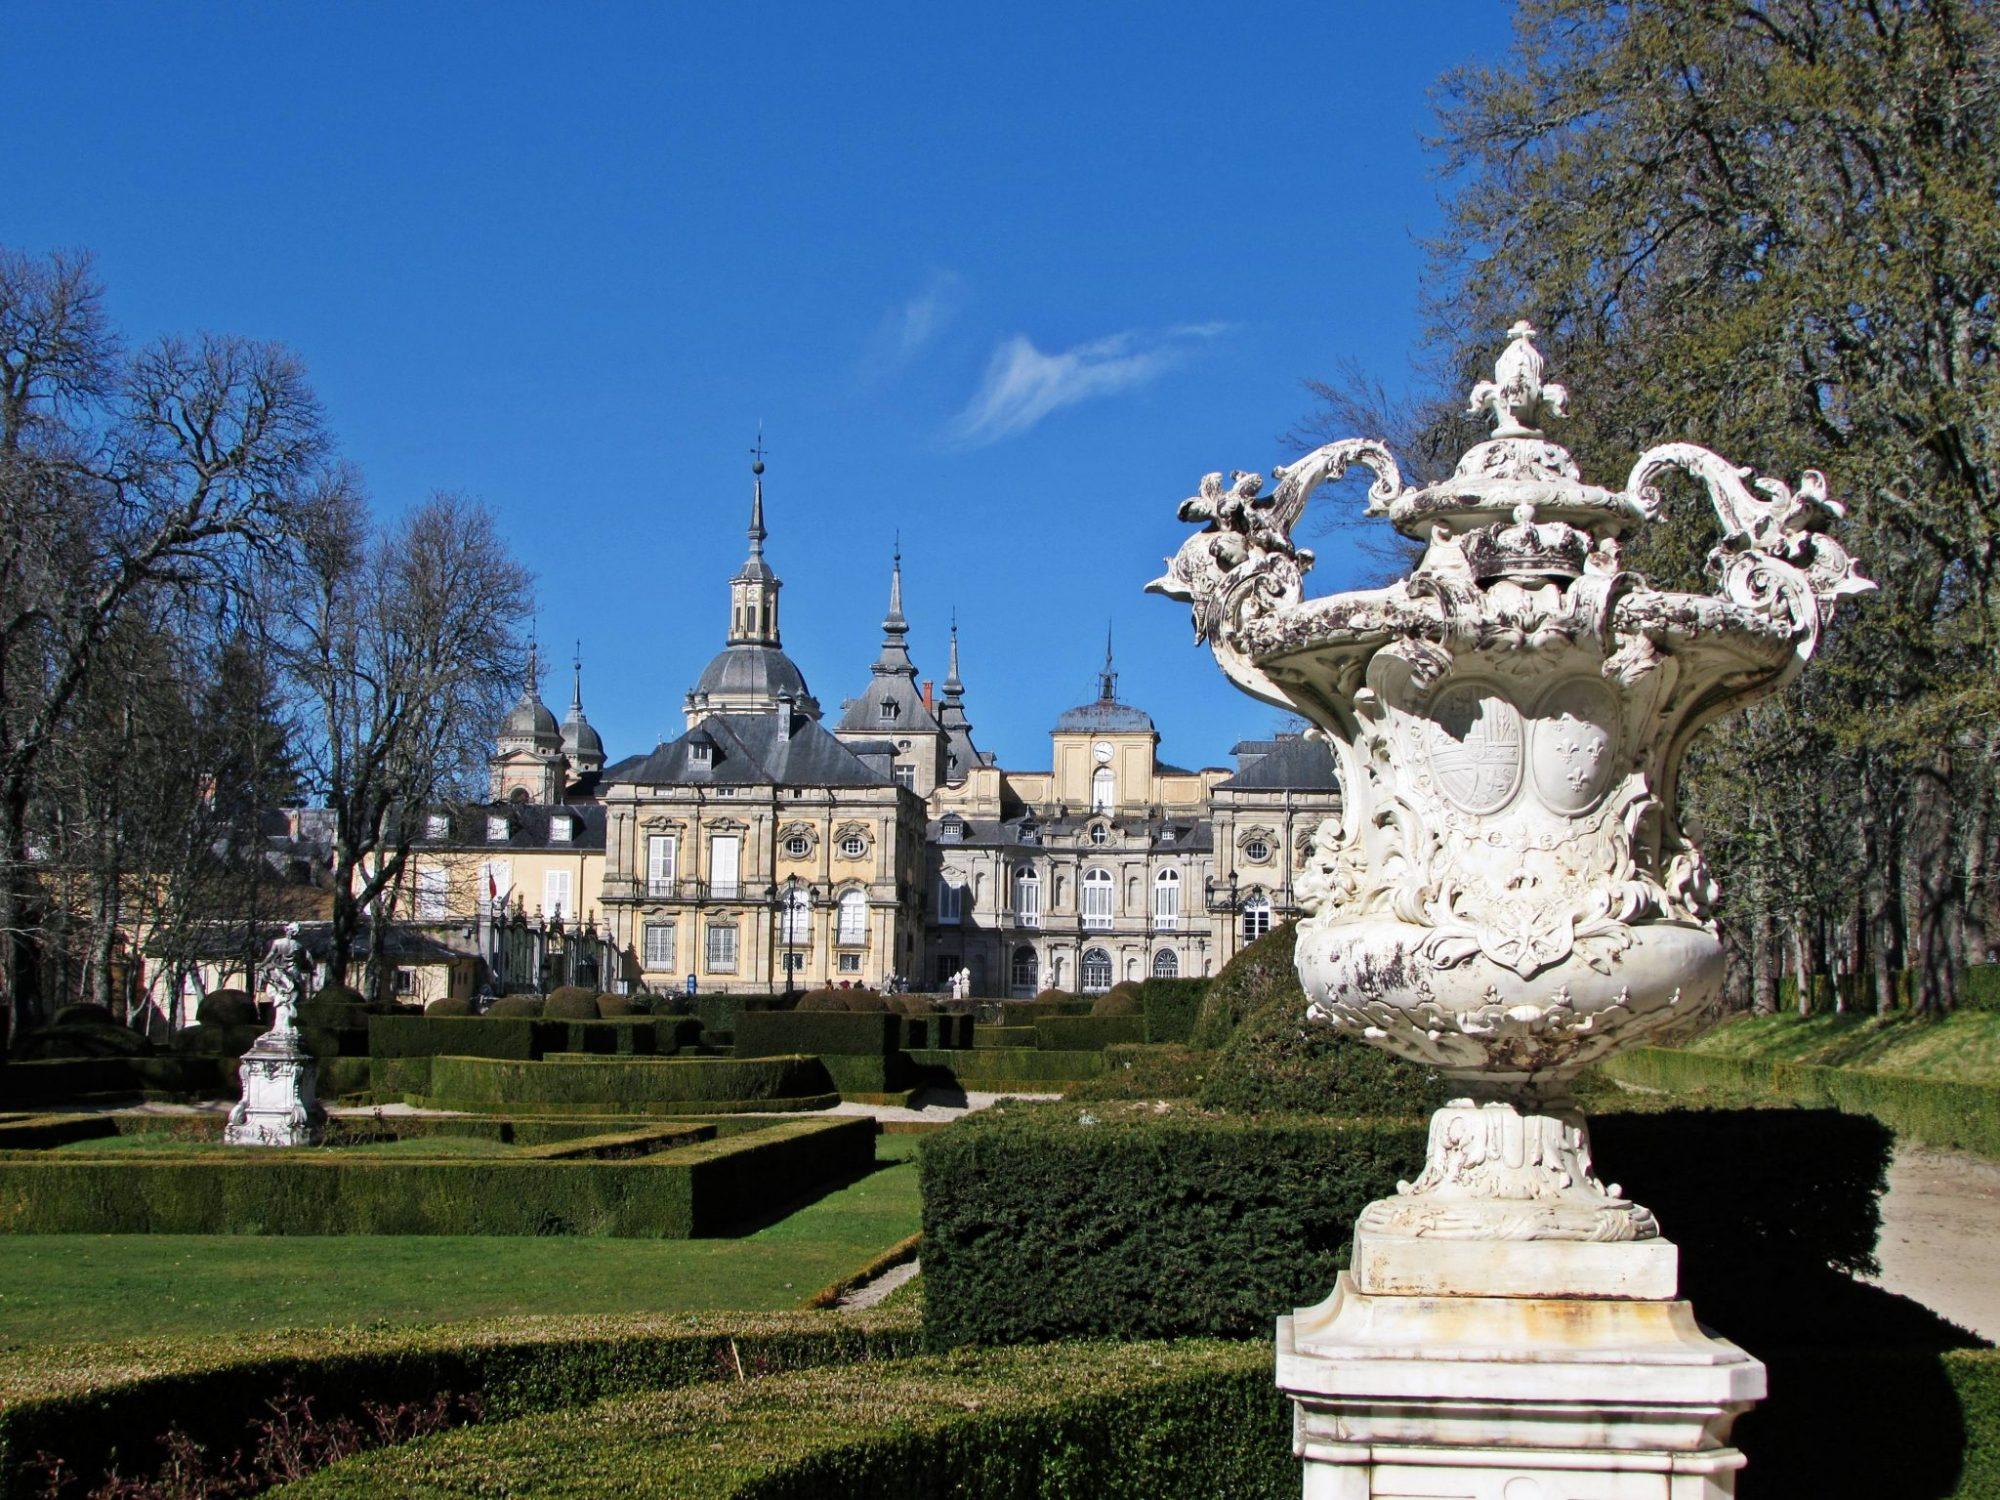 Palacio real de la granja de san ildefonso en segovia el for Jardines de san ildefonso